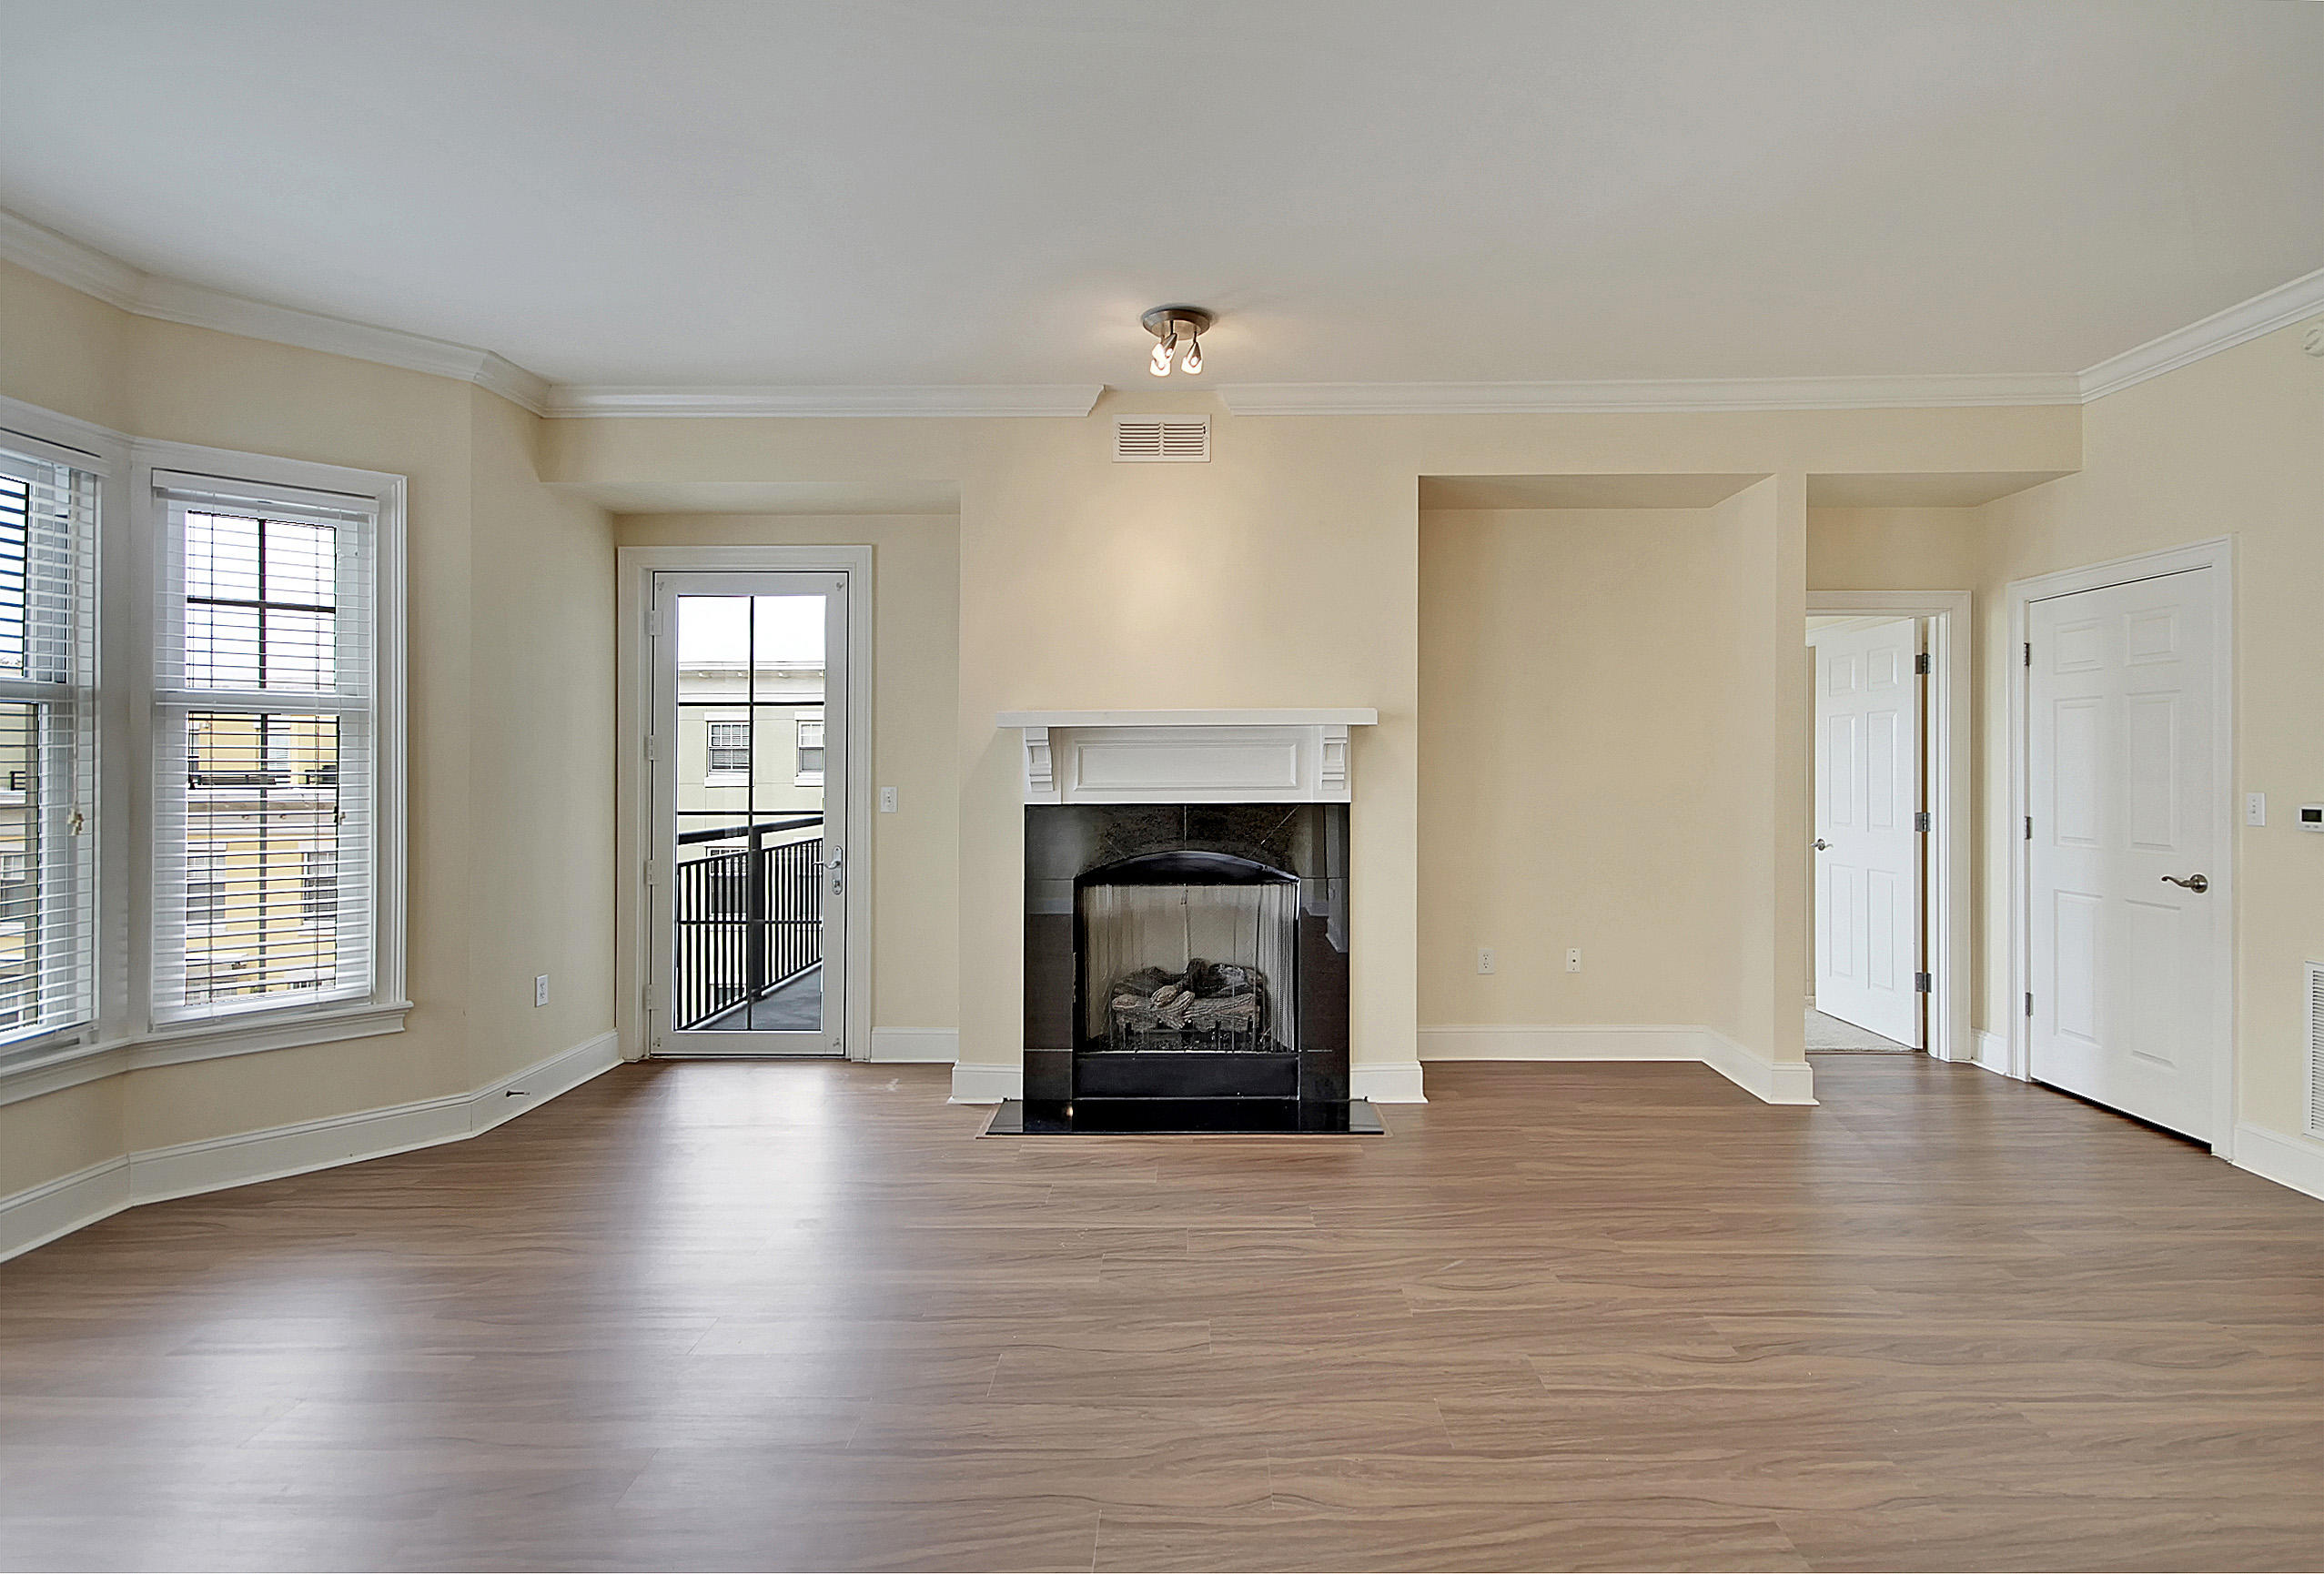 Albemarle Condos For Sale - 498 Albemarle, Charleston, SC - 41